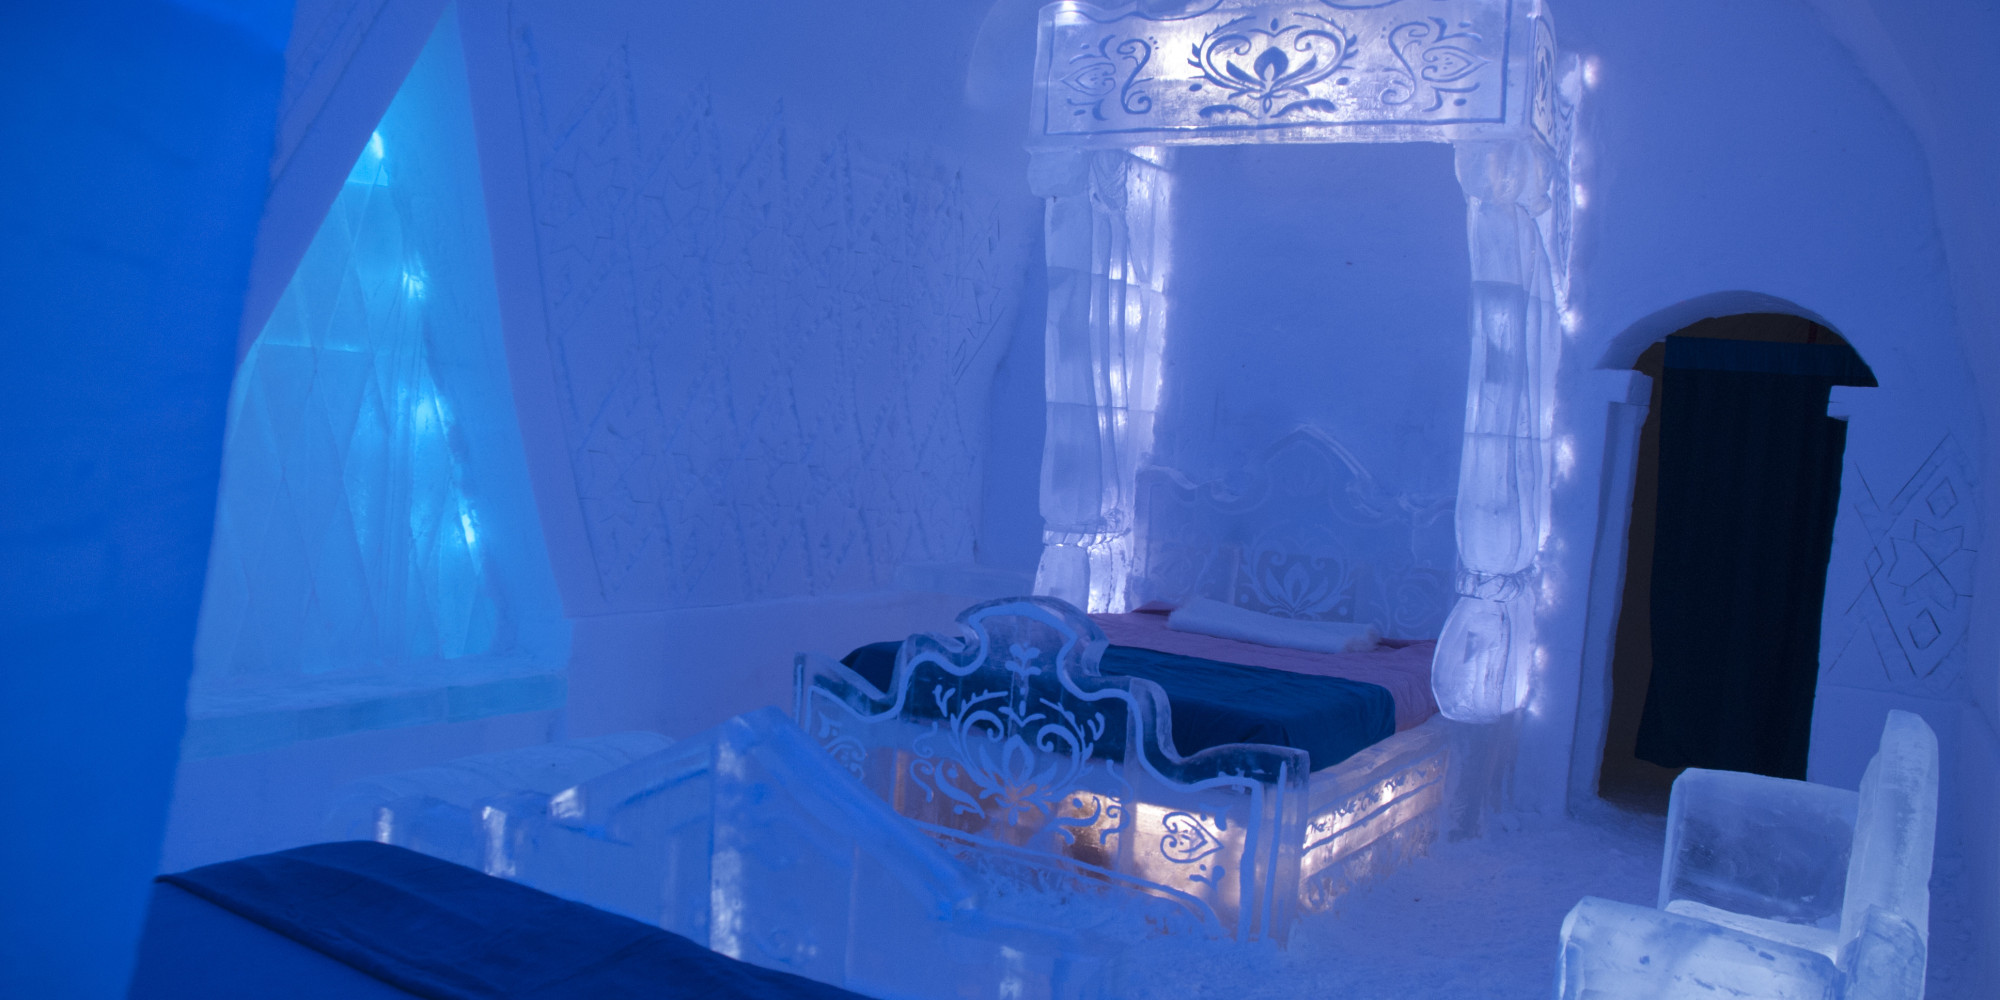 39 frozen 39 suite at hotel de glace is super cool. Black Bedroom Furniture Sets. Home Design Ideas